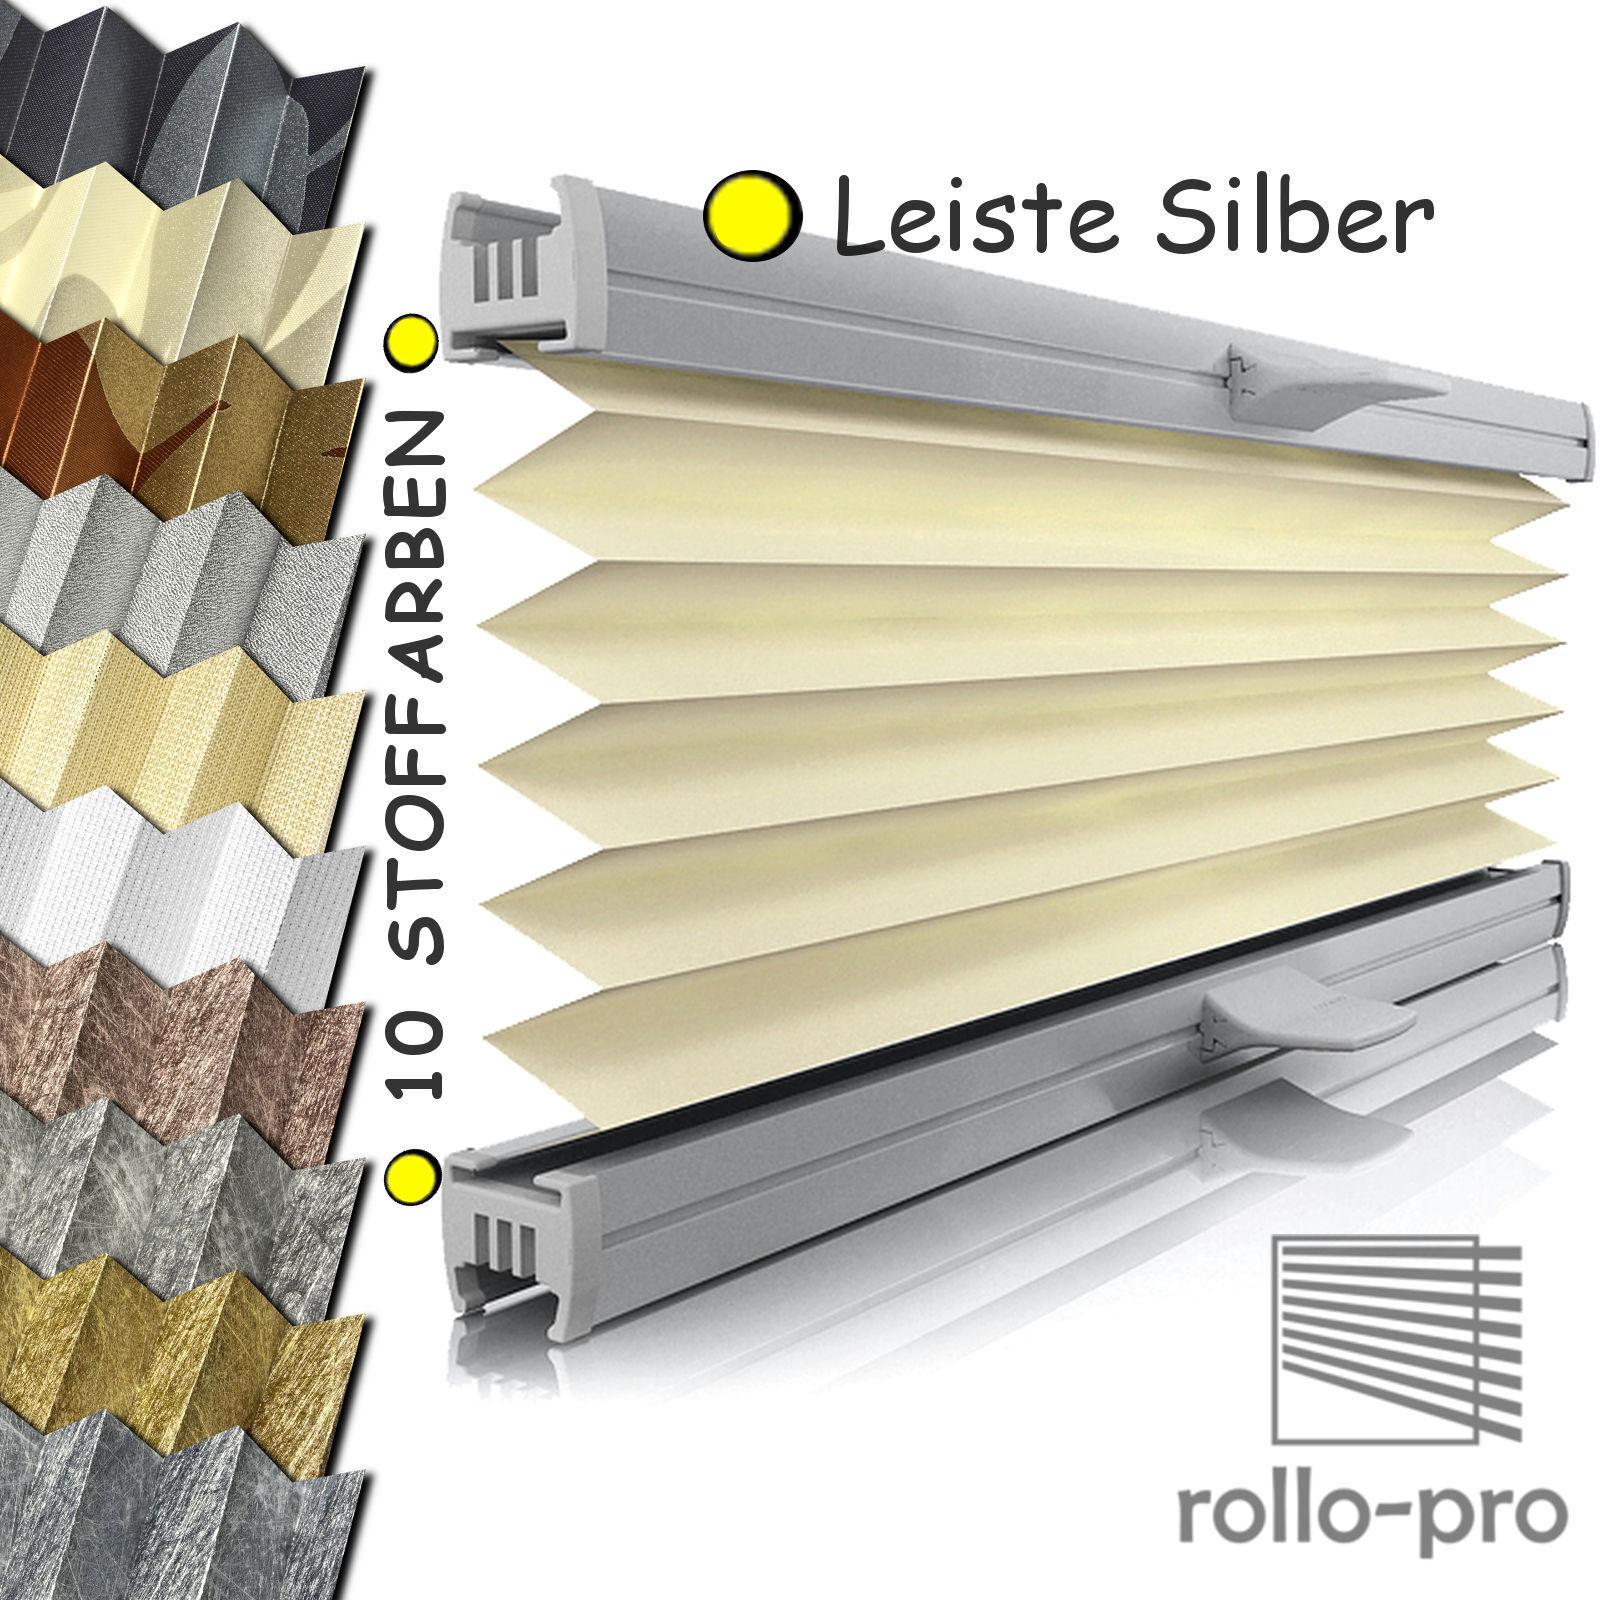 Plissee Faltrollo ohne Bohren Plisee nach Maß Klemmfix  METALLICO  Profil Silber